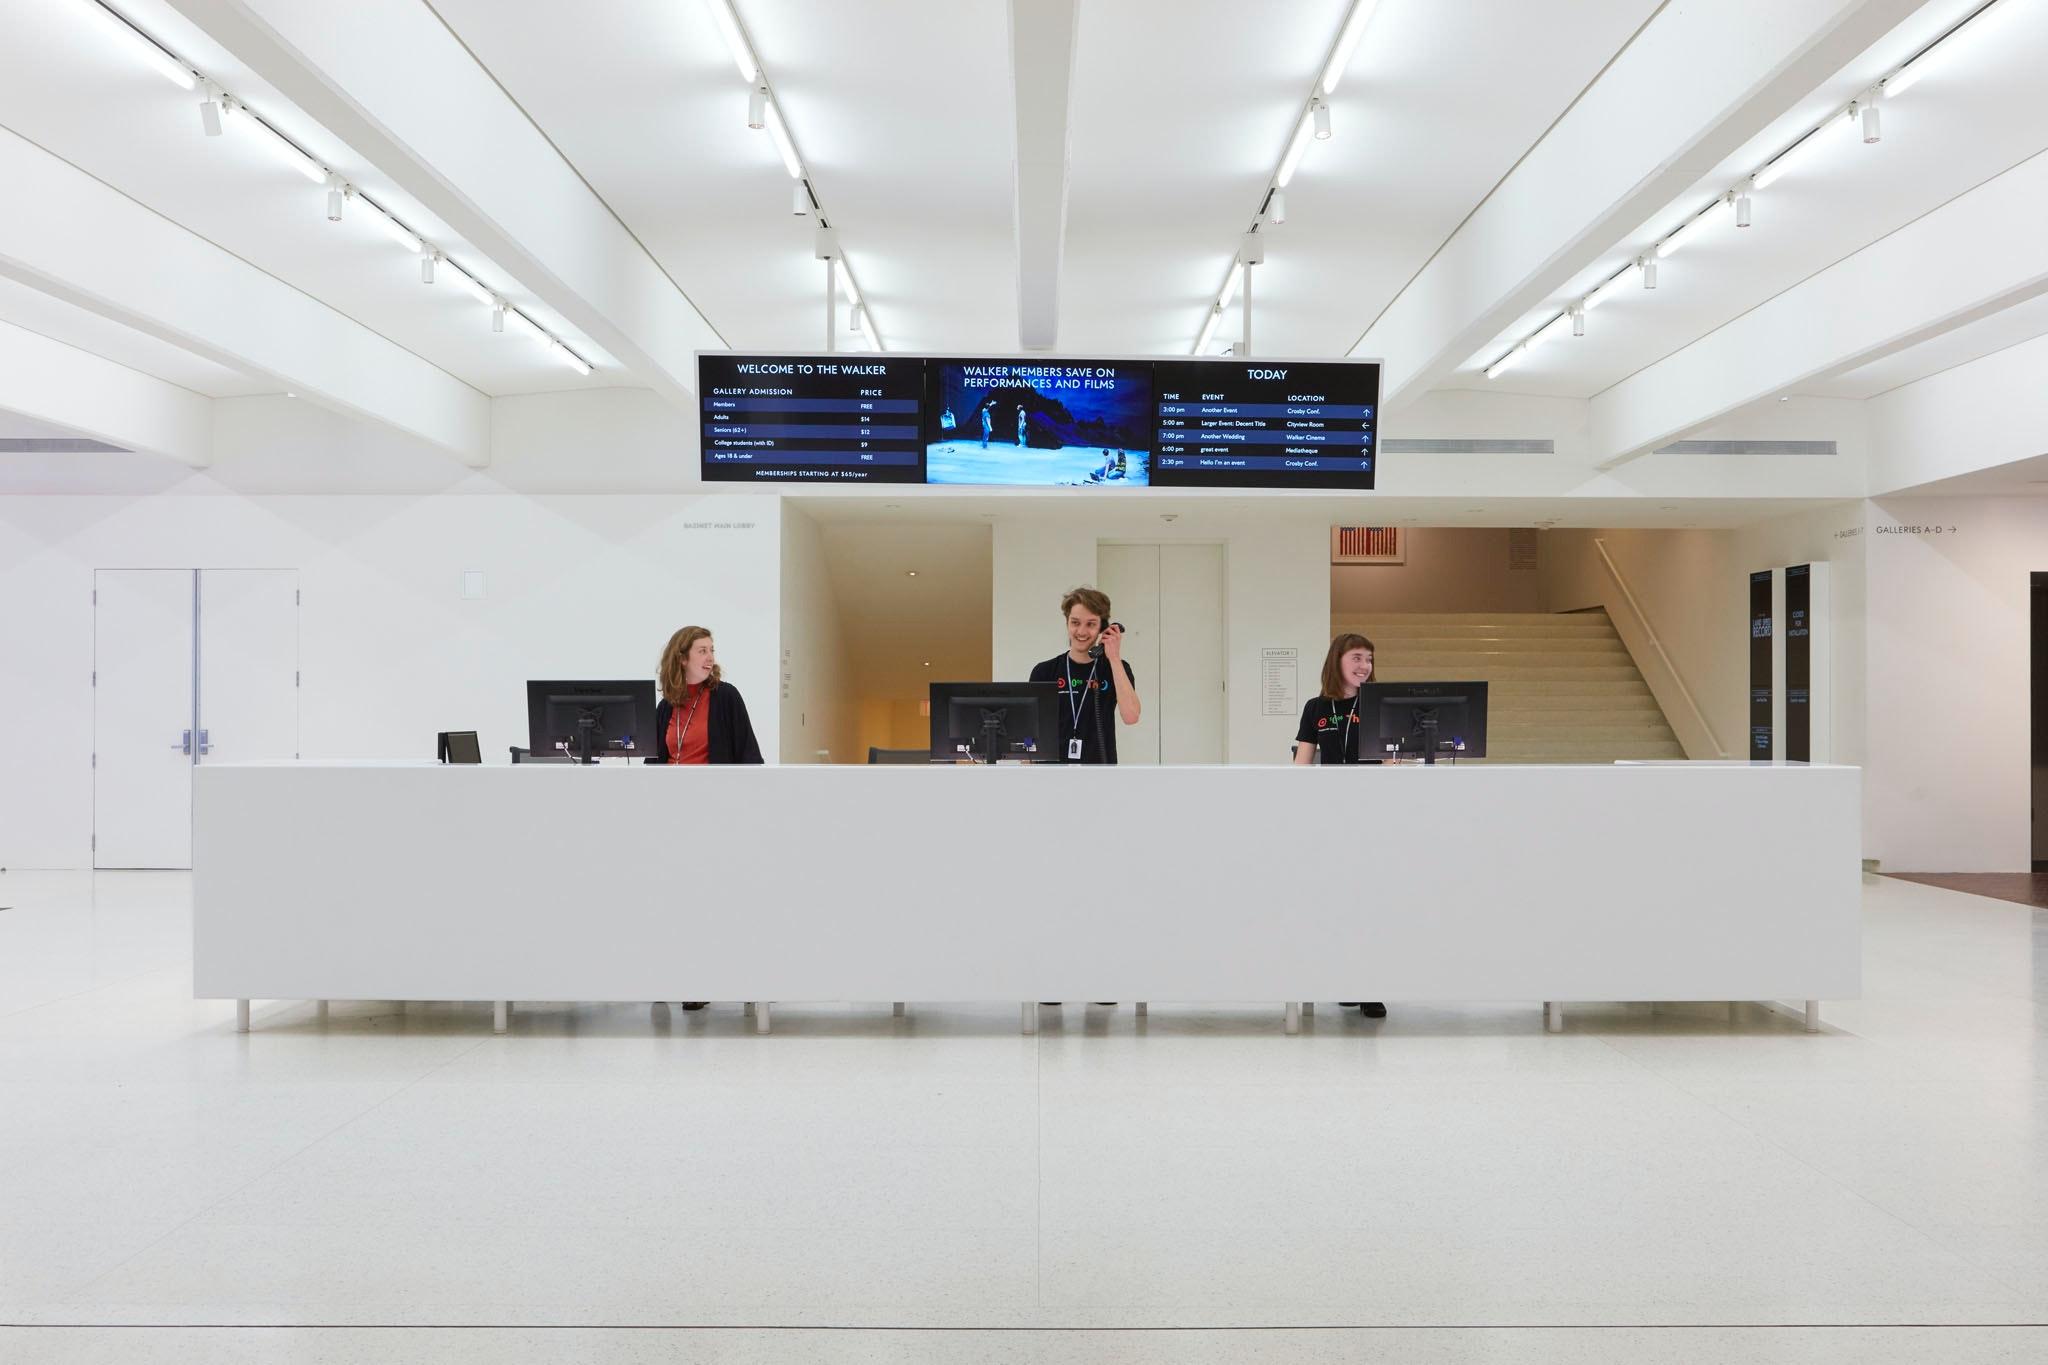 Walker Staff At Main Lobby Desk